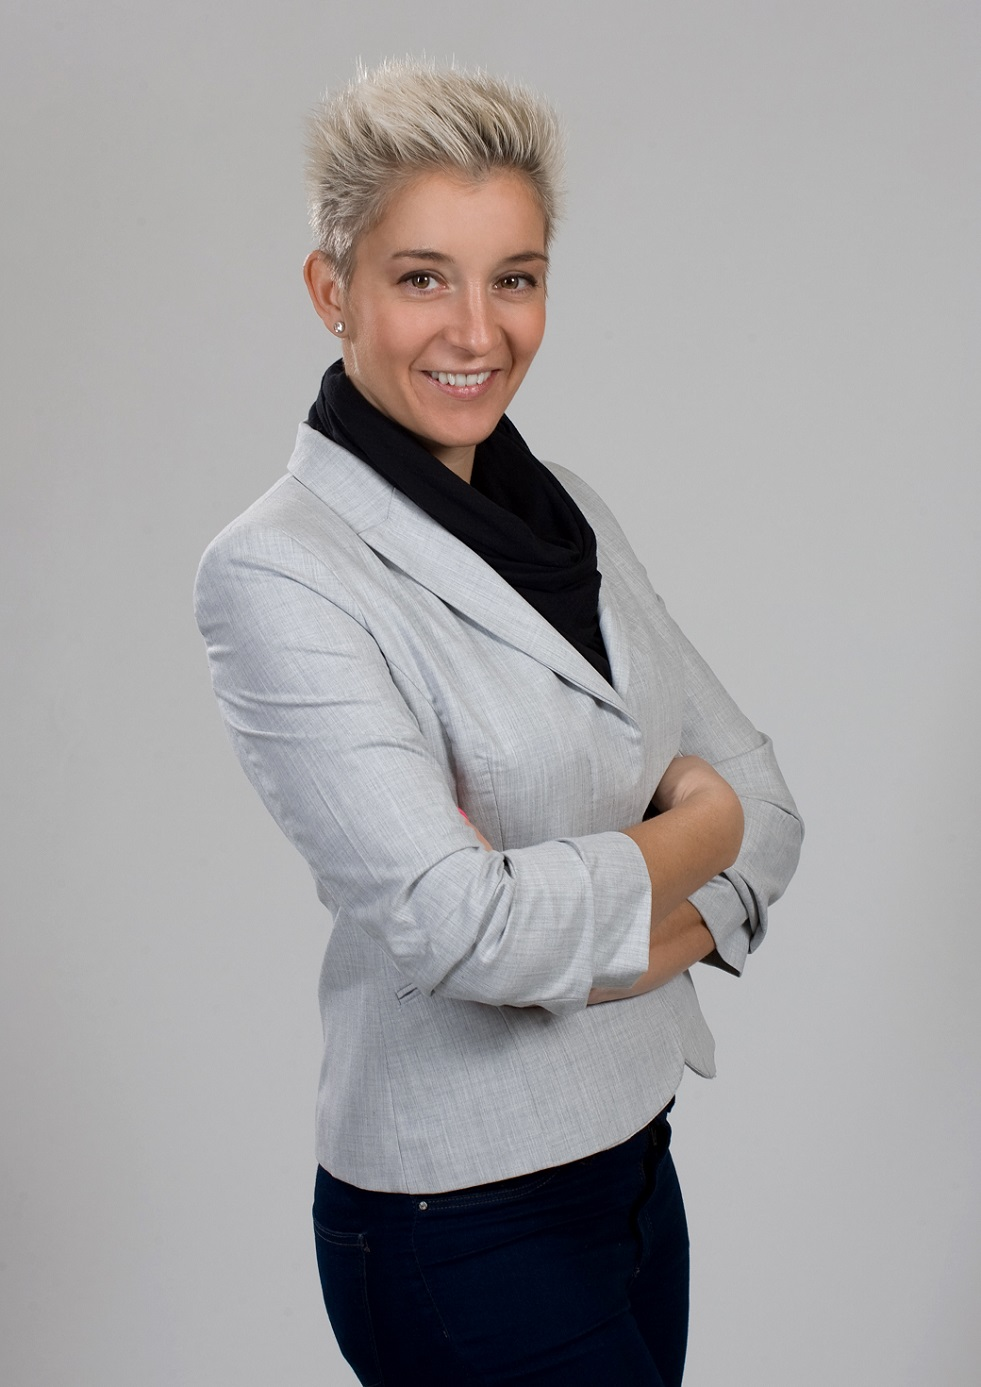 Veronika Bartošová